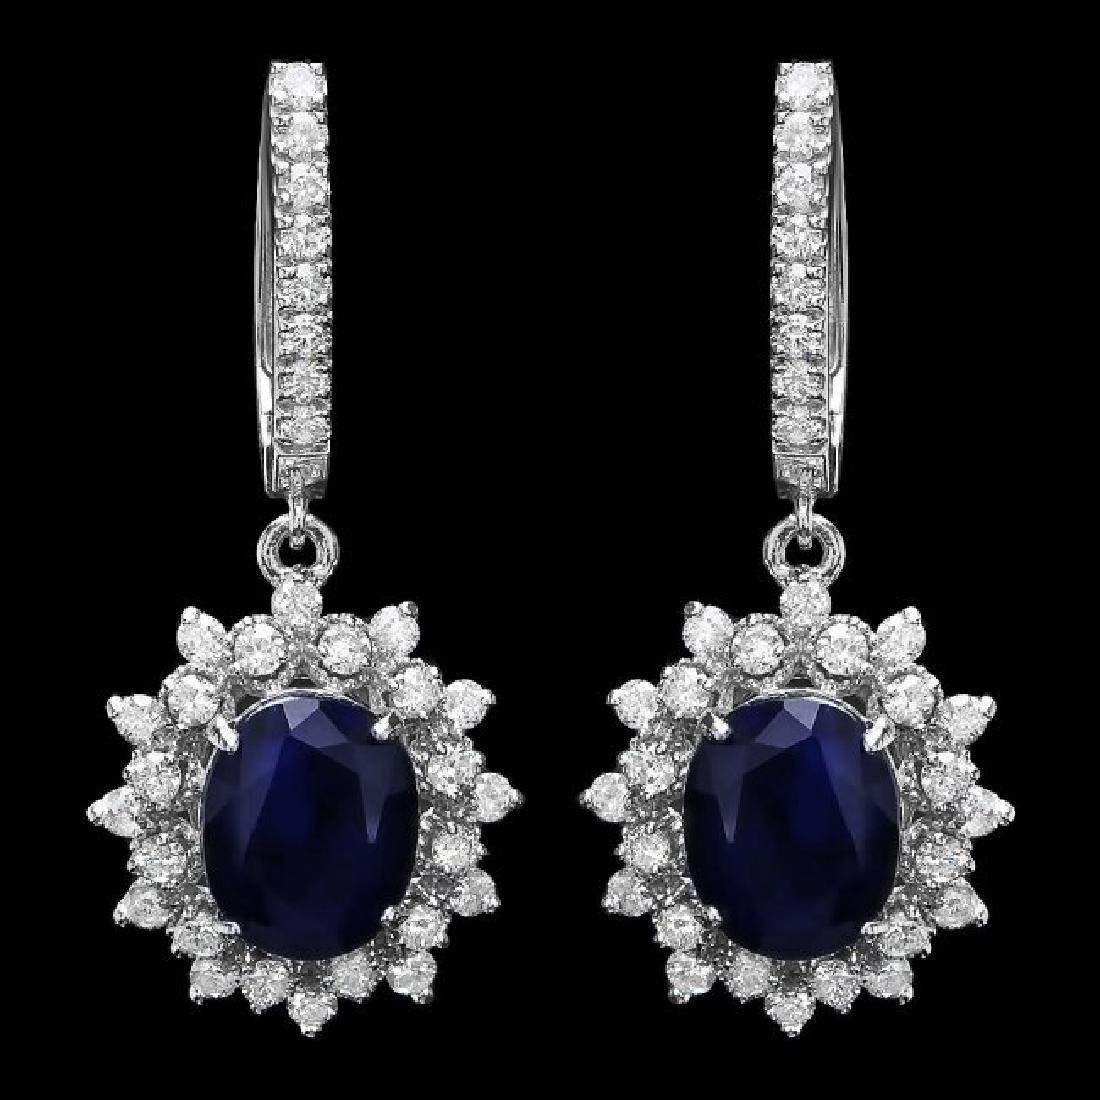 14k Gold 5.5ct Sapphire 1.70ct Diamond Earrings